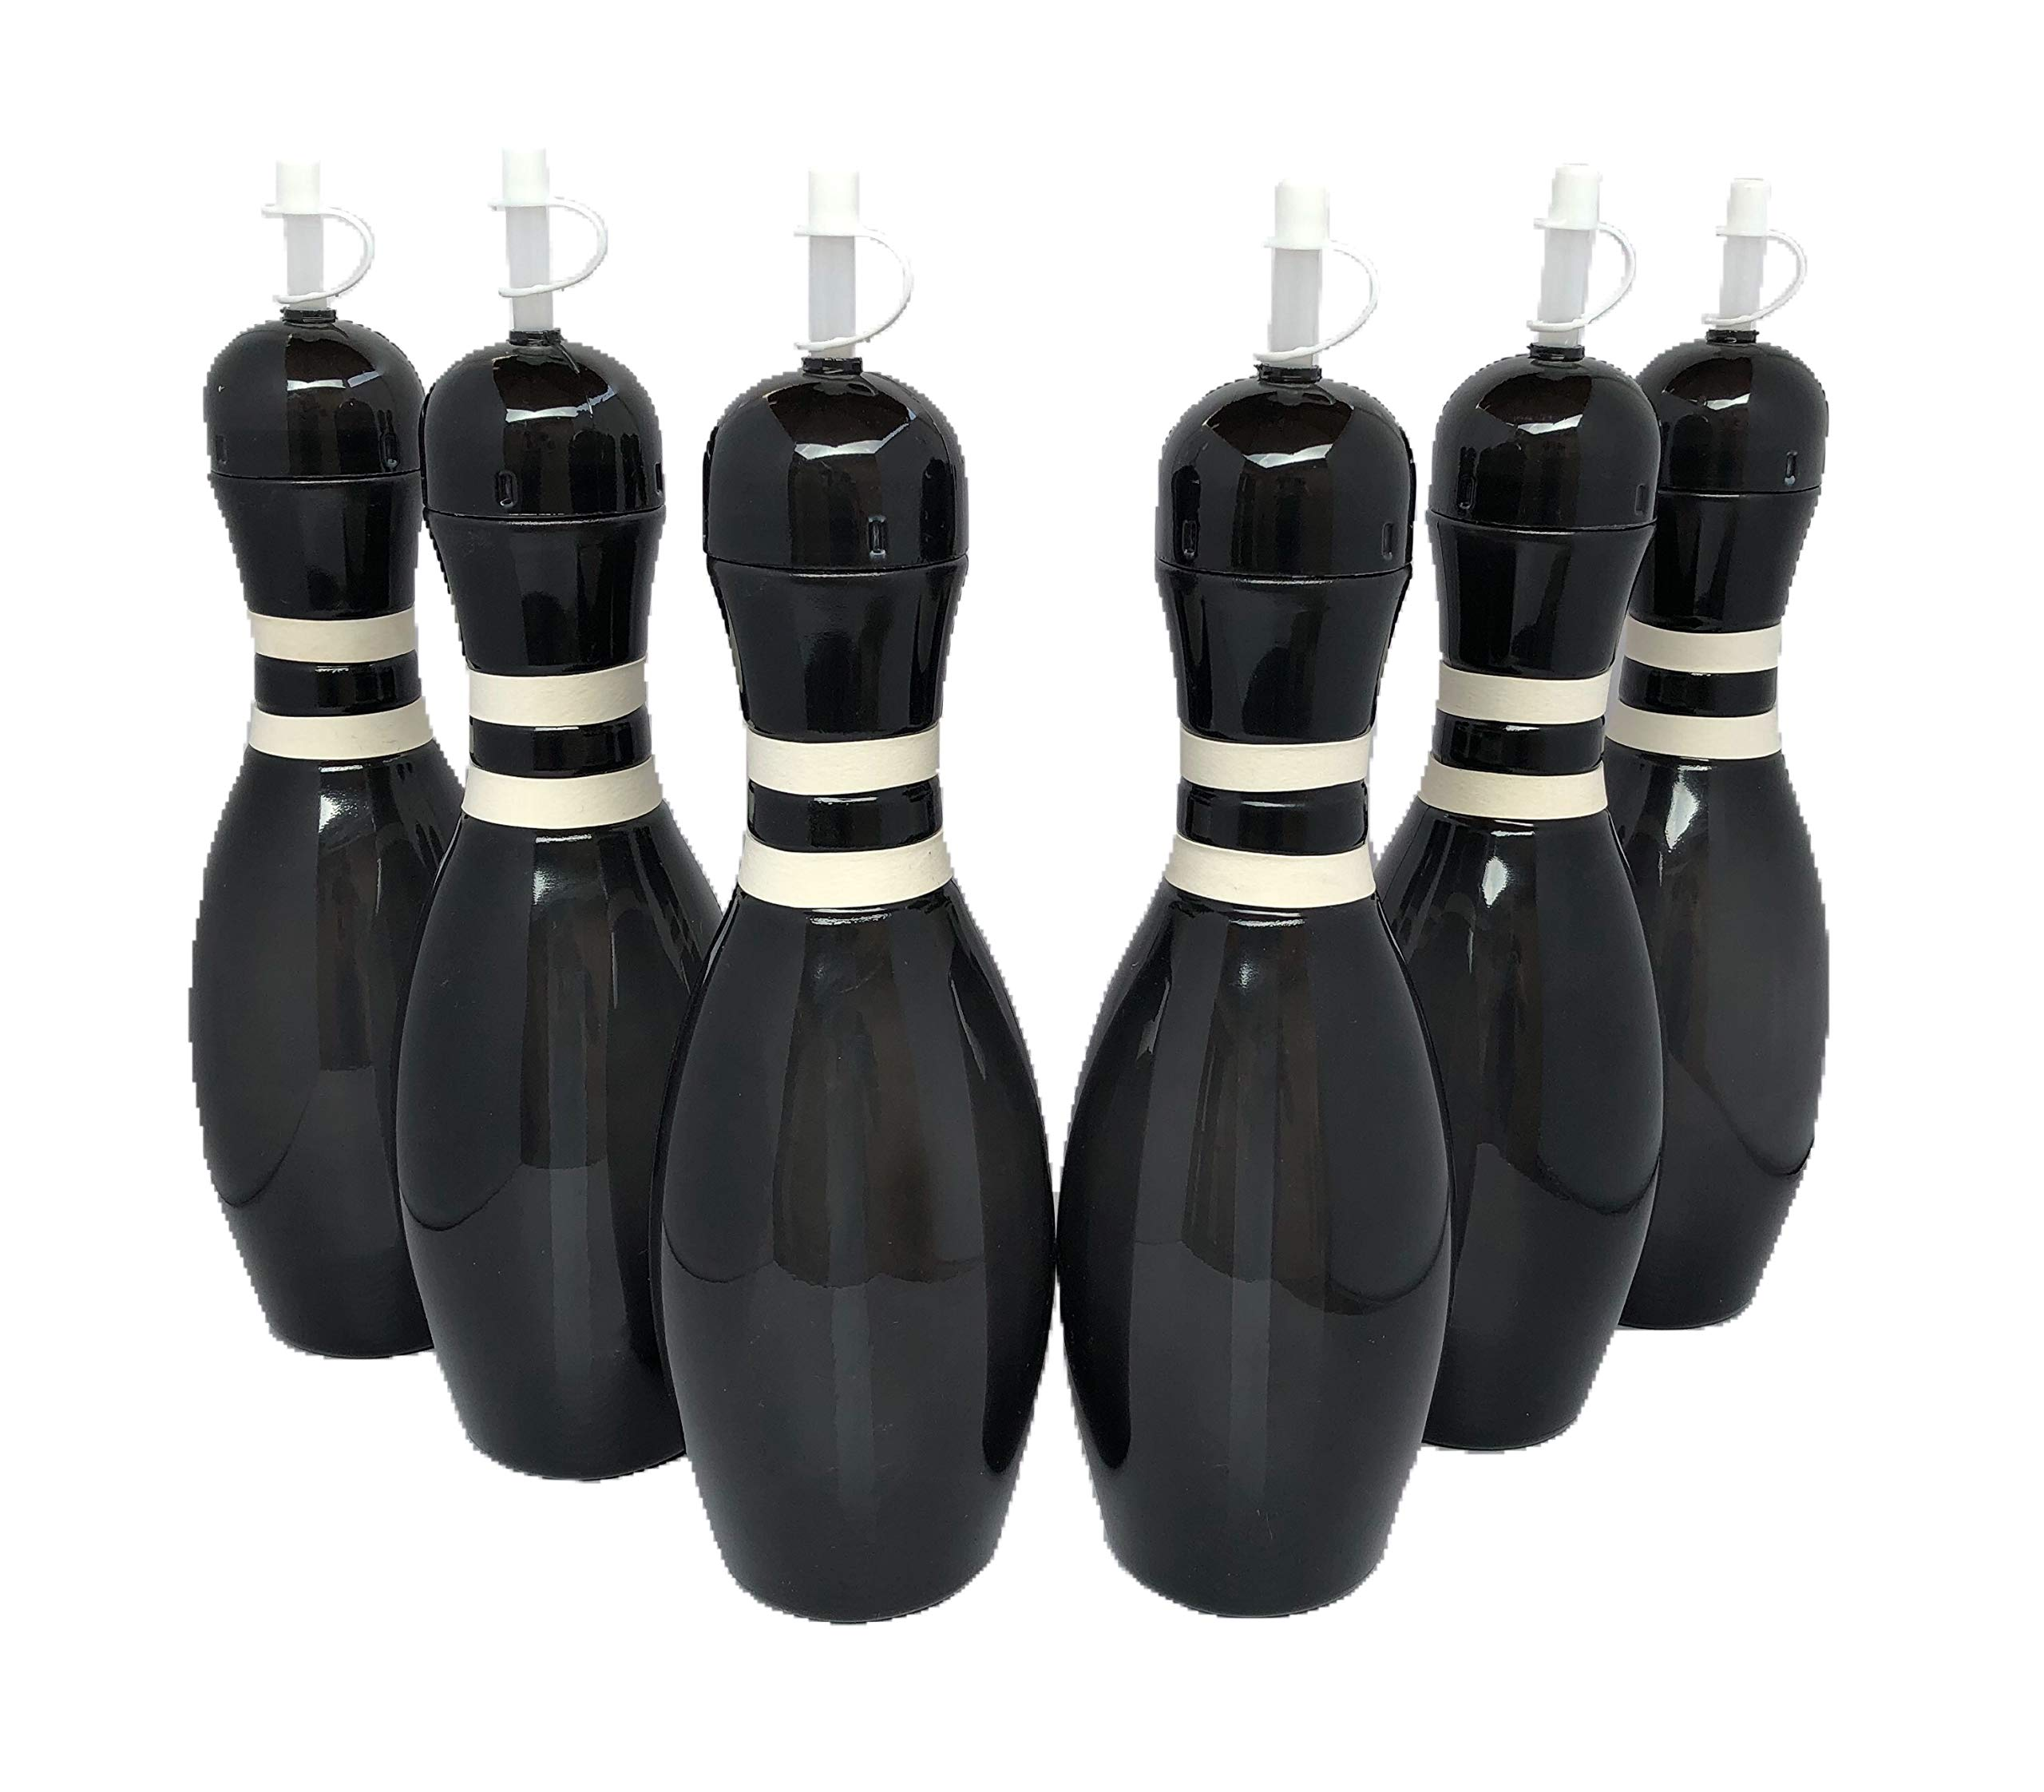 Large Bowling Pin Water Bottles Black - 6 Pack by Sierra Novelty Bowling Stuff